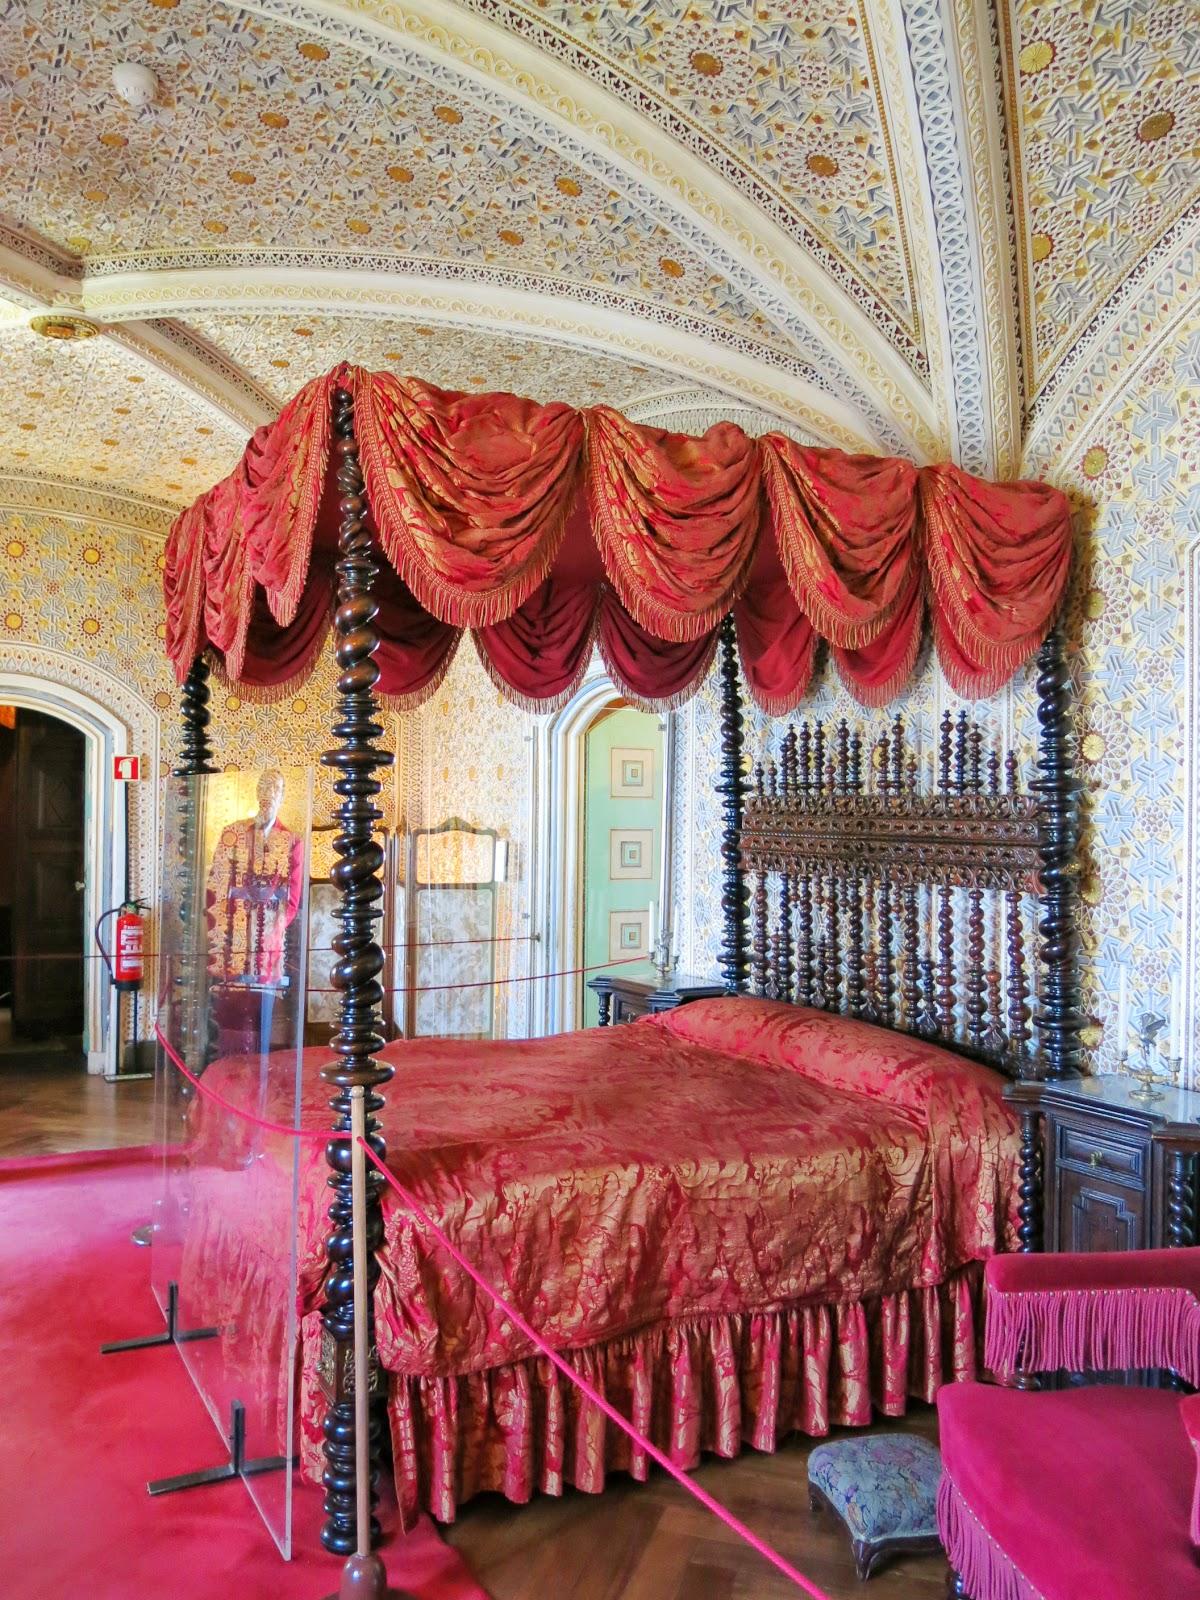 Insidan av Palácio Nacional da Pena